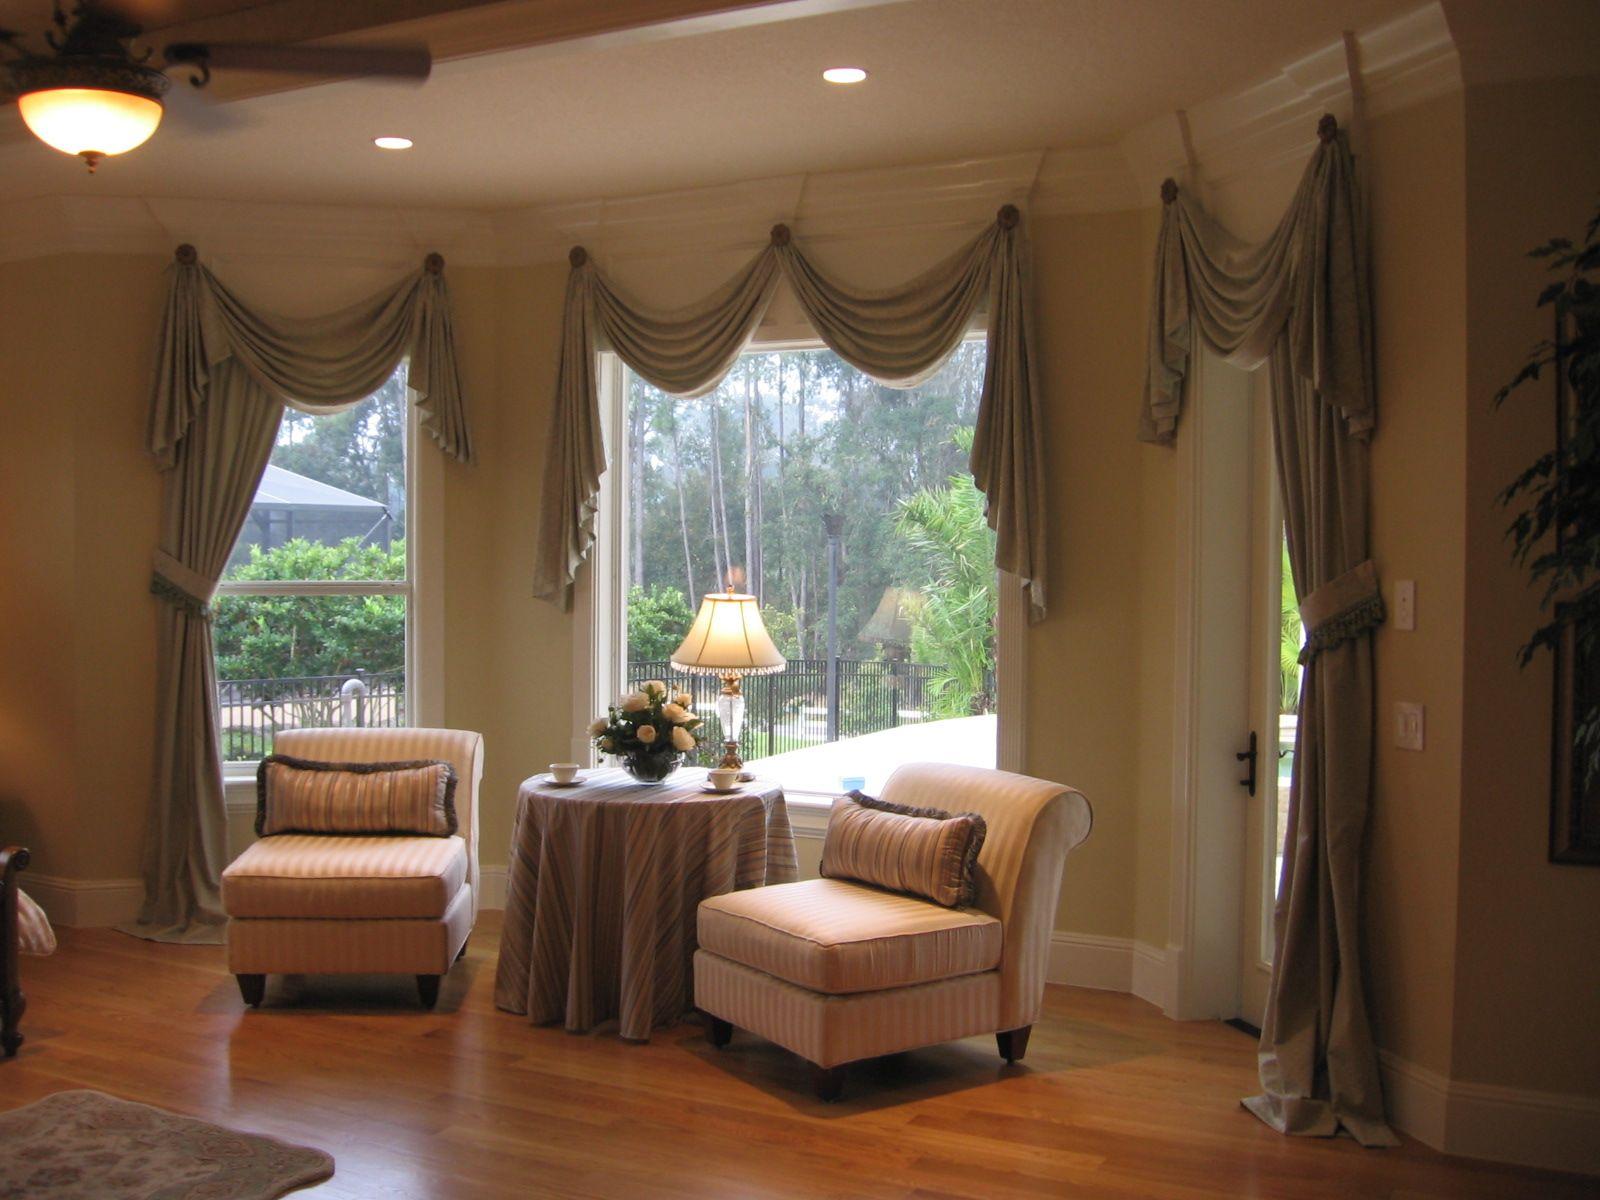 Window dressing ideas for arched windows  photos of window treatments  google search  window decor